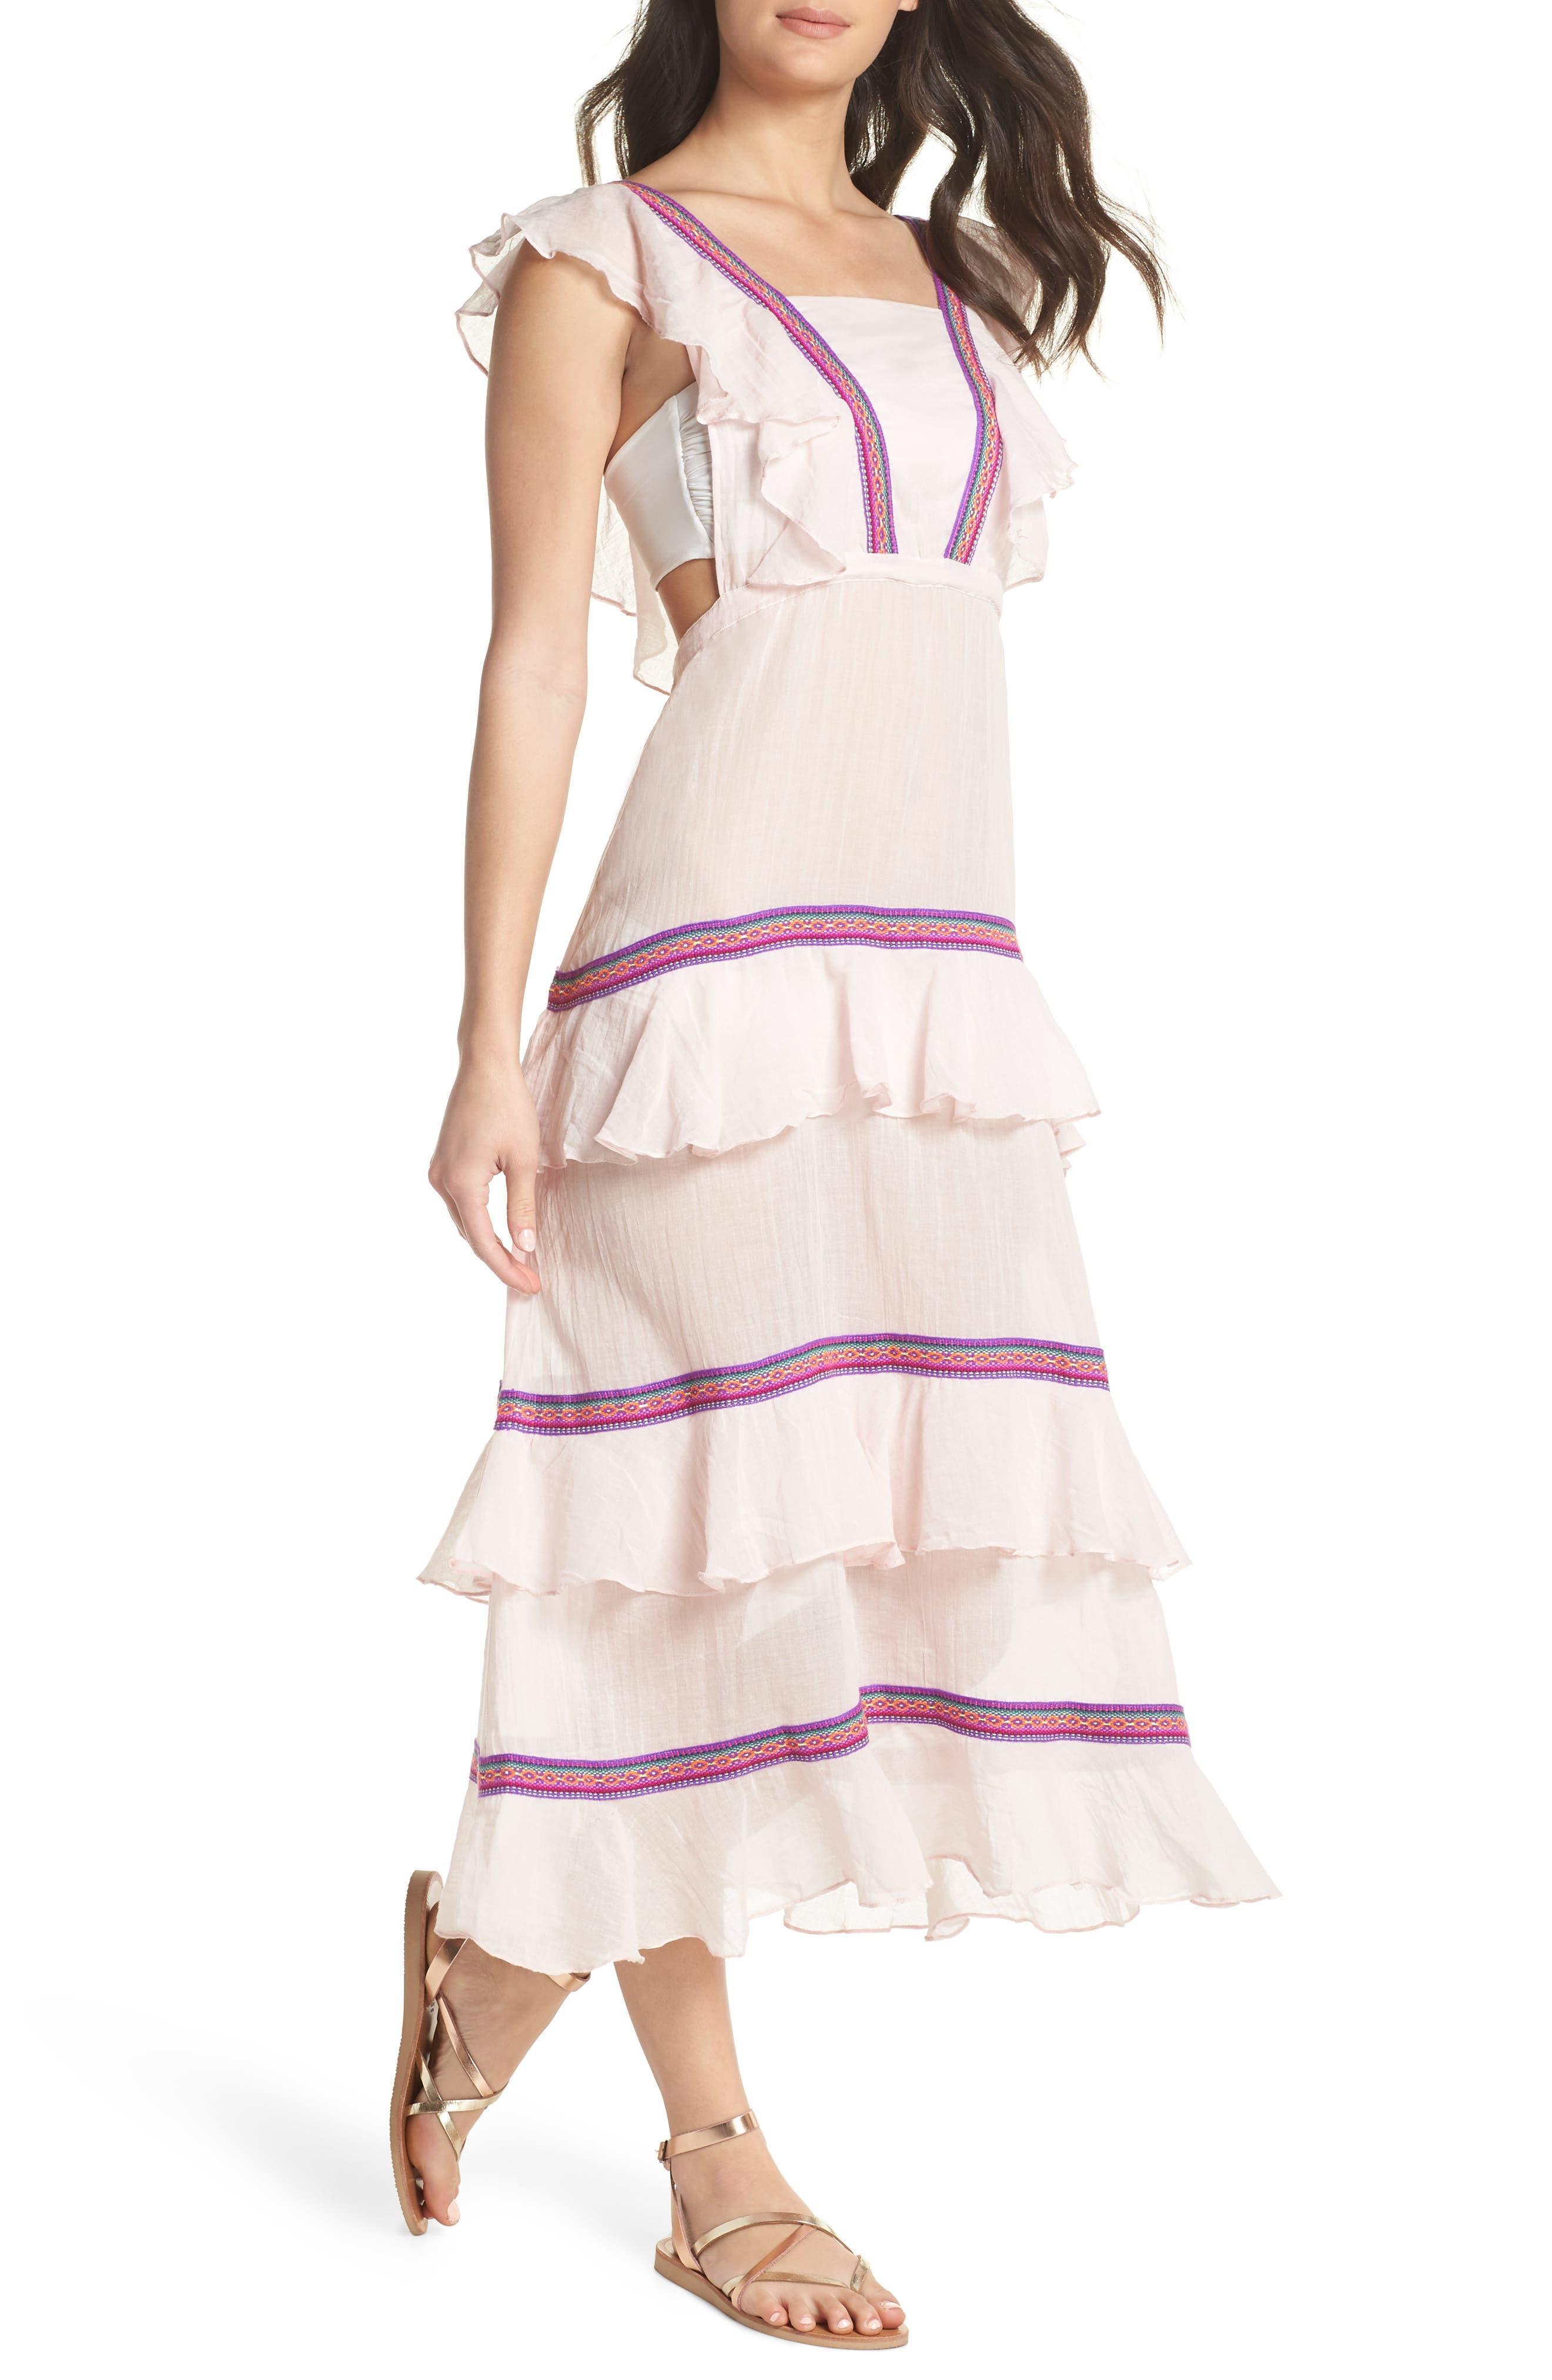 PITUSA Eve Cover-Up Dress